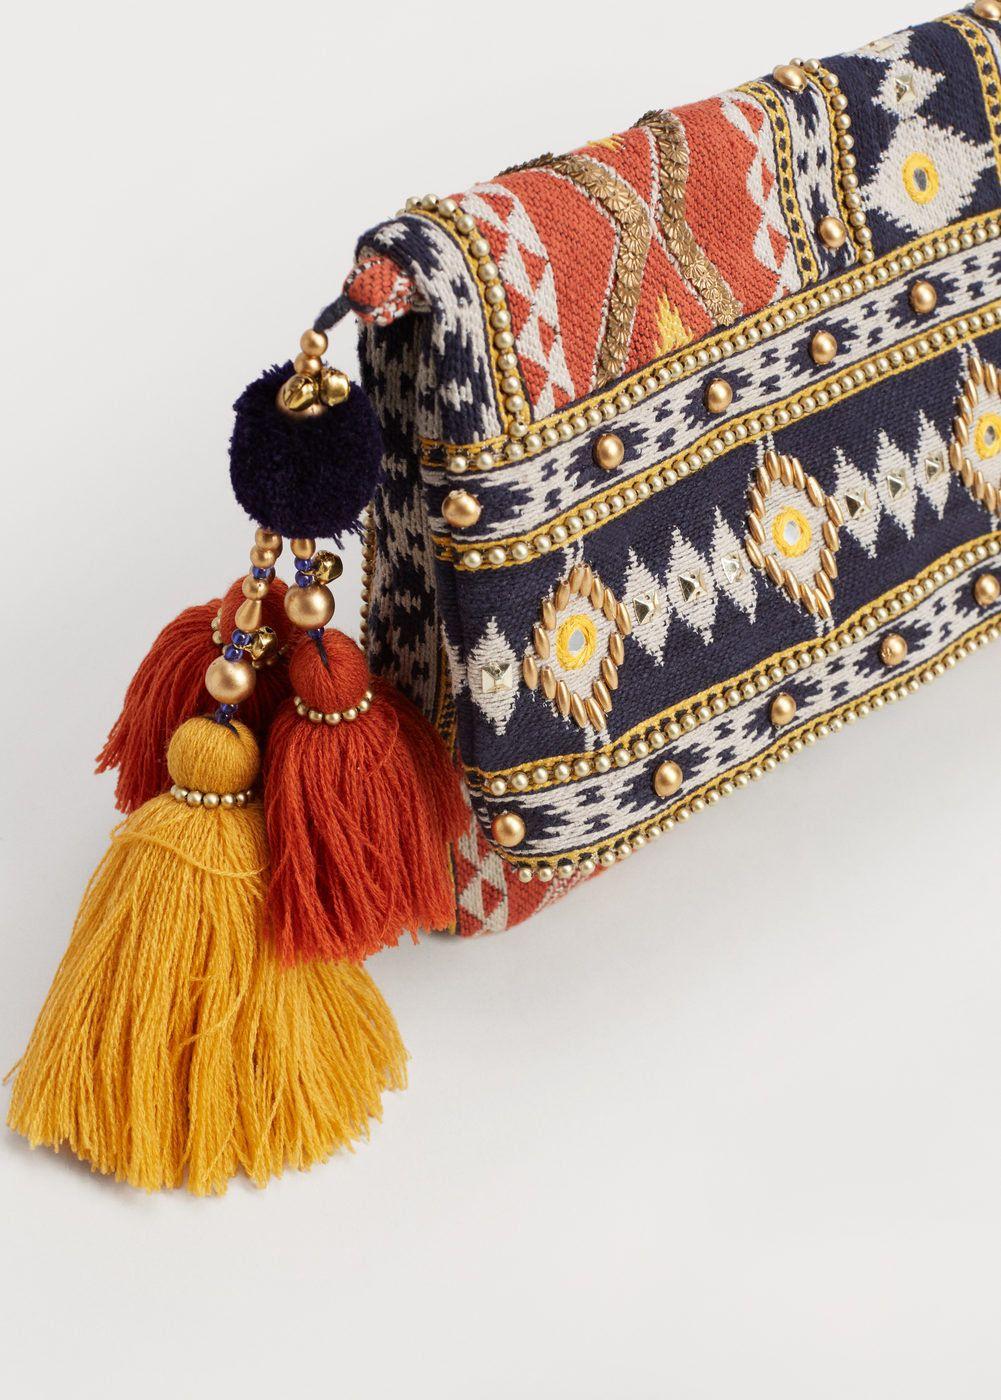 92d0c39cc Clutch étnico - Tamanhos grandes   Embroidery   Bags, Ethnic bag e ...